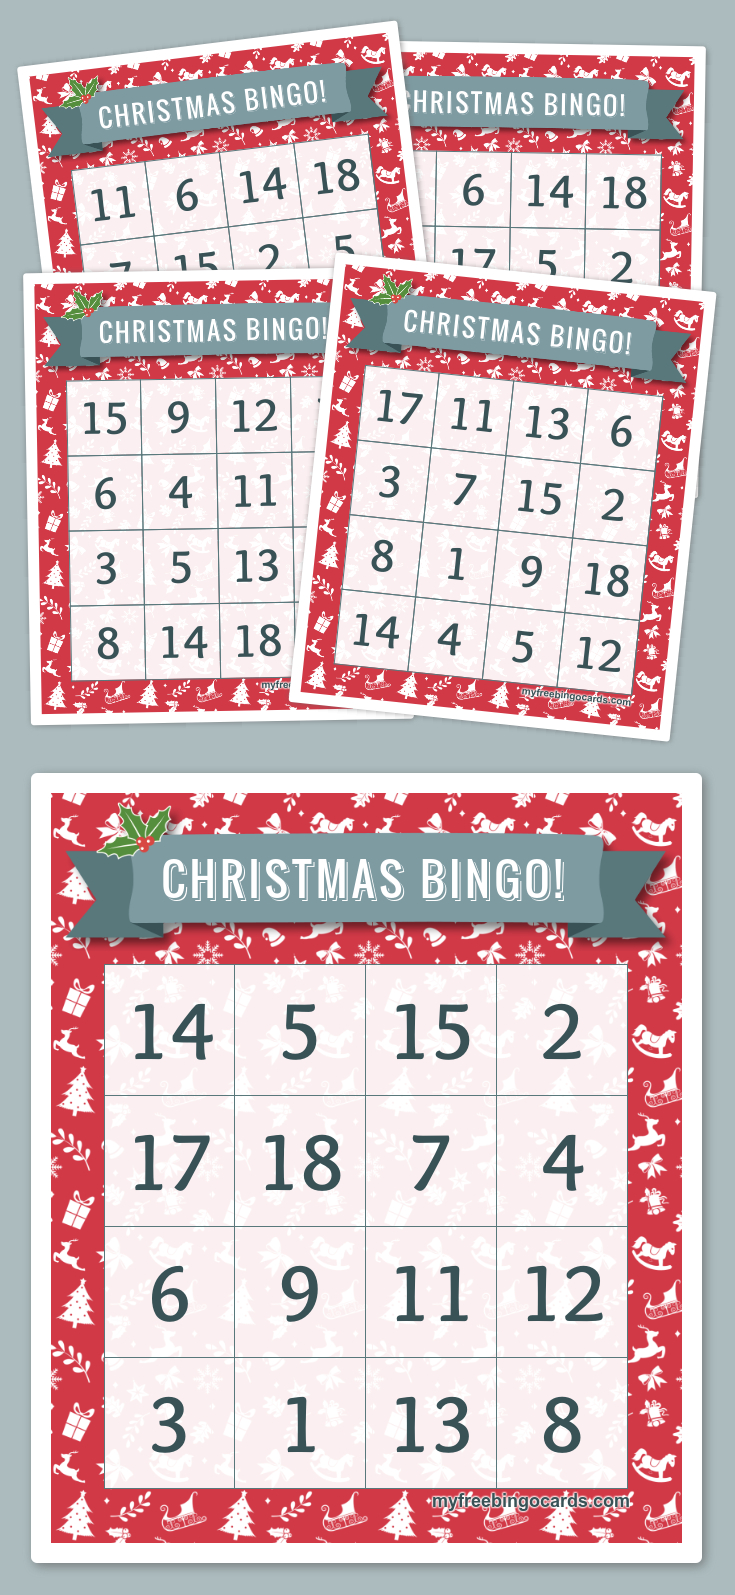 Christmas Bingo! | Free Printable Bingo Cards, Bingo Cards